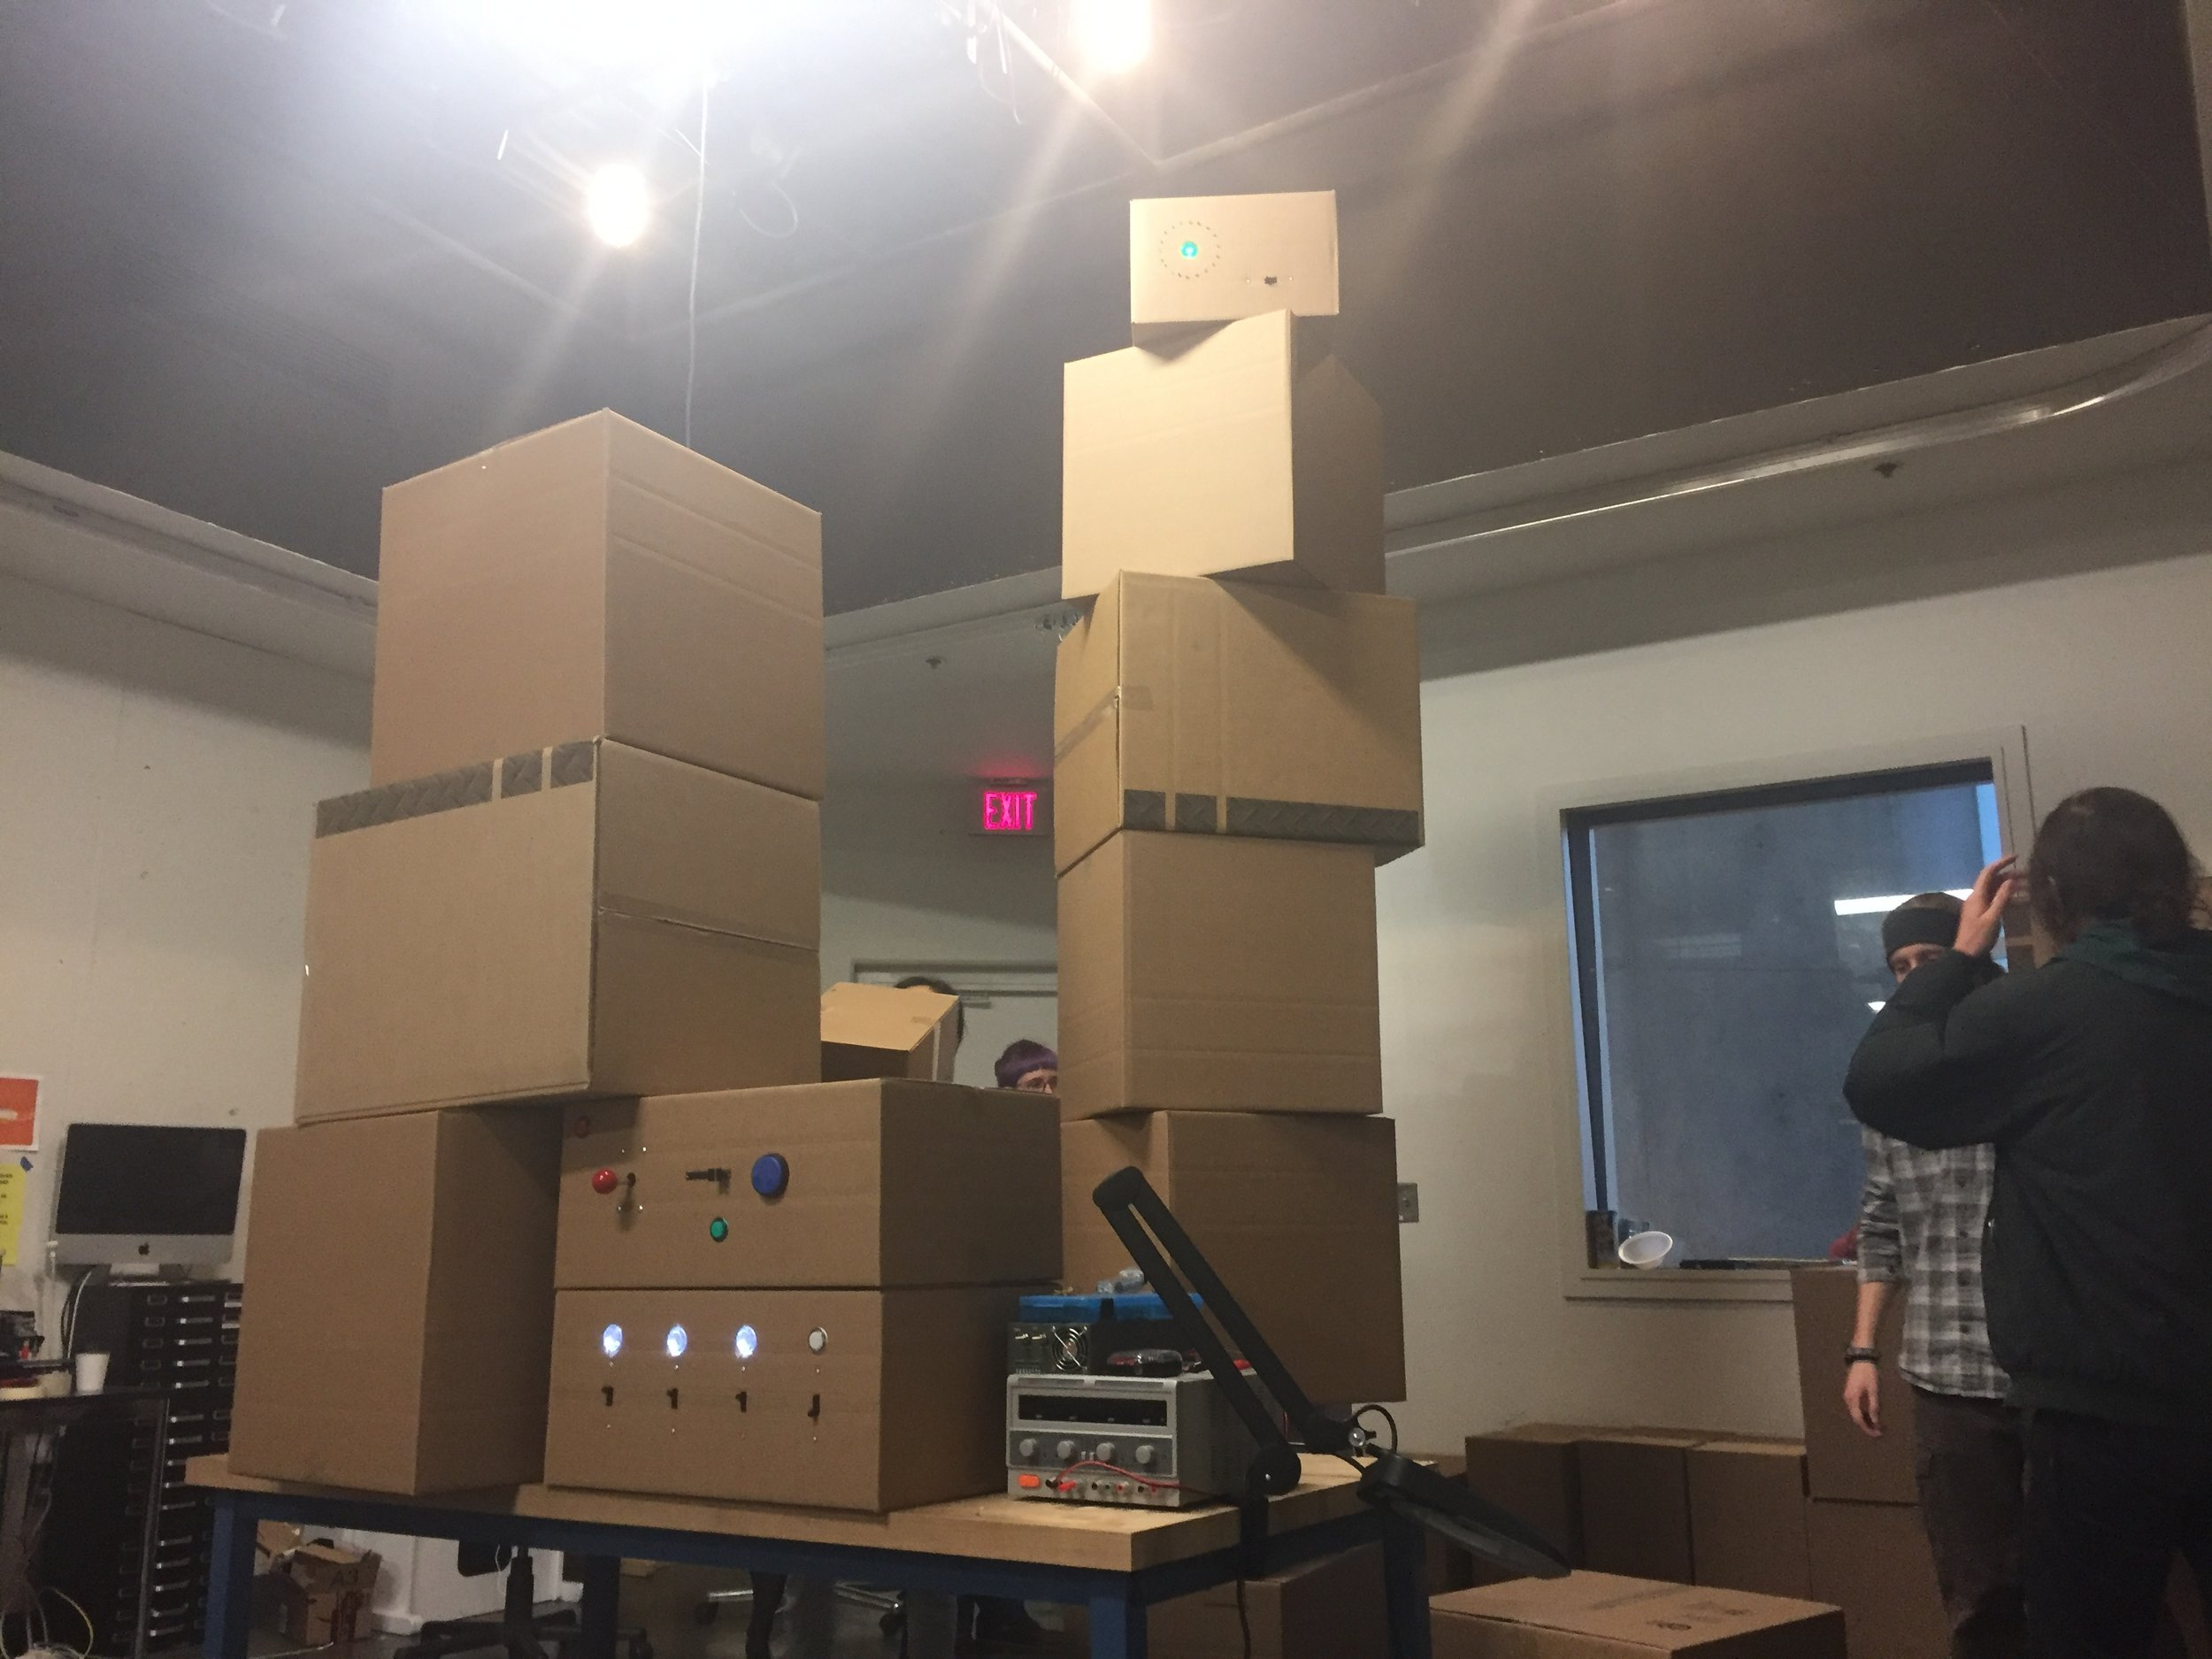 Boxes 2016 (Collaboration with Viditya Voleti)